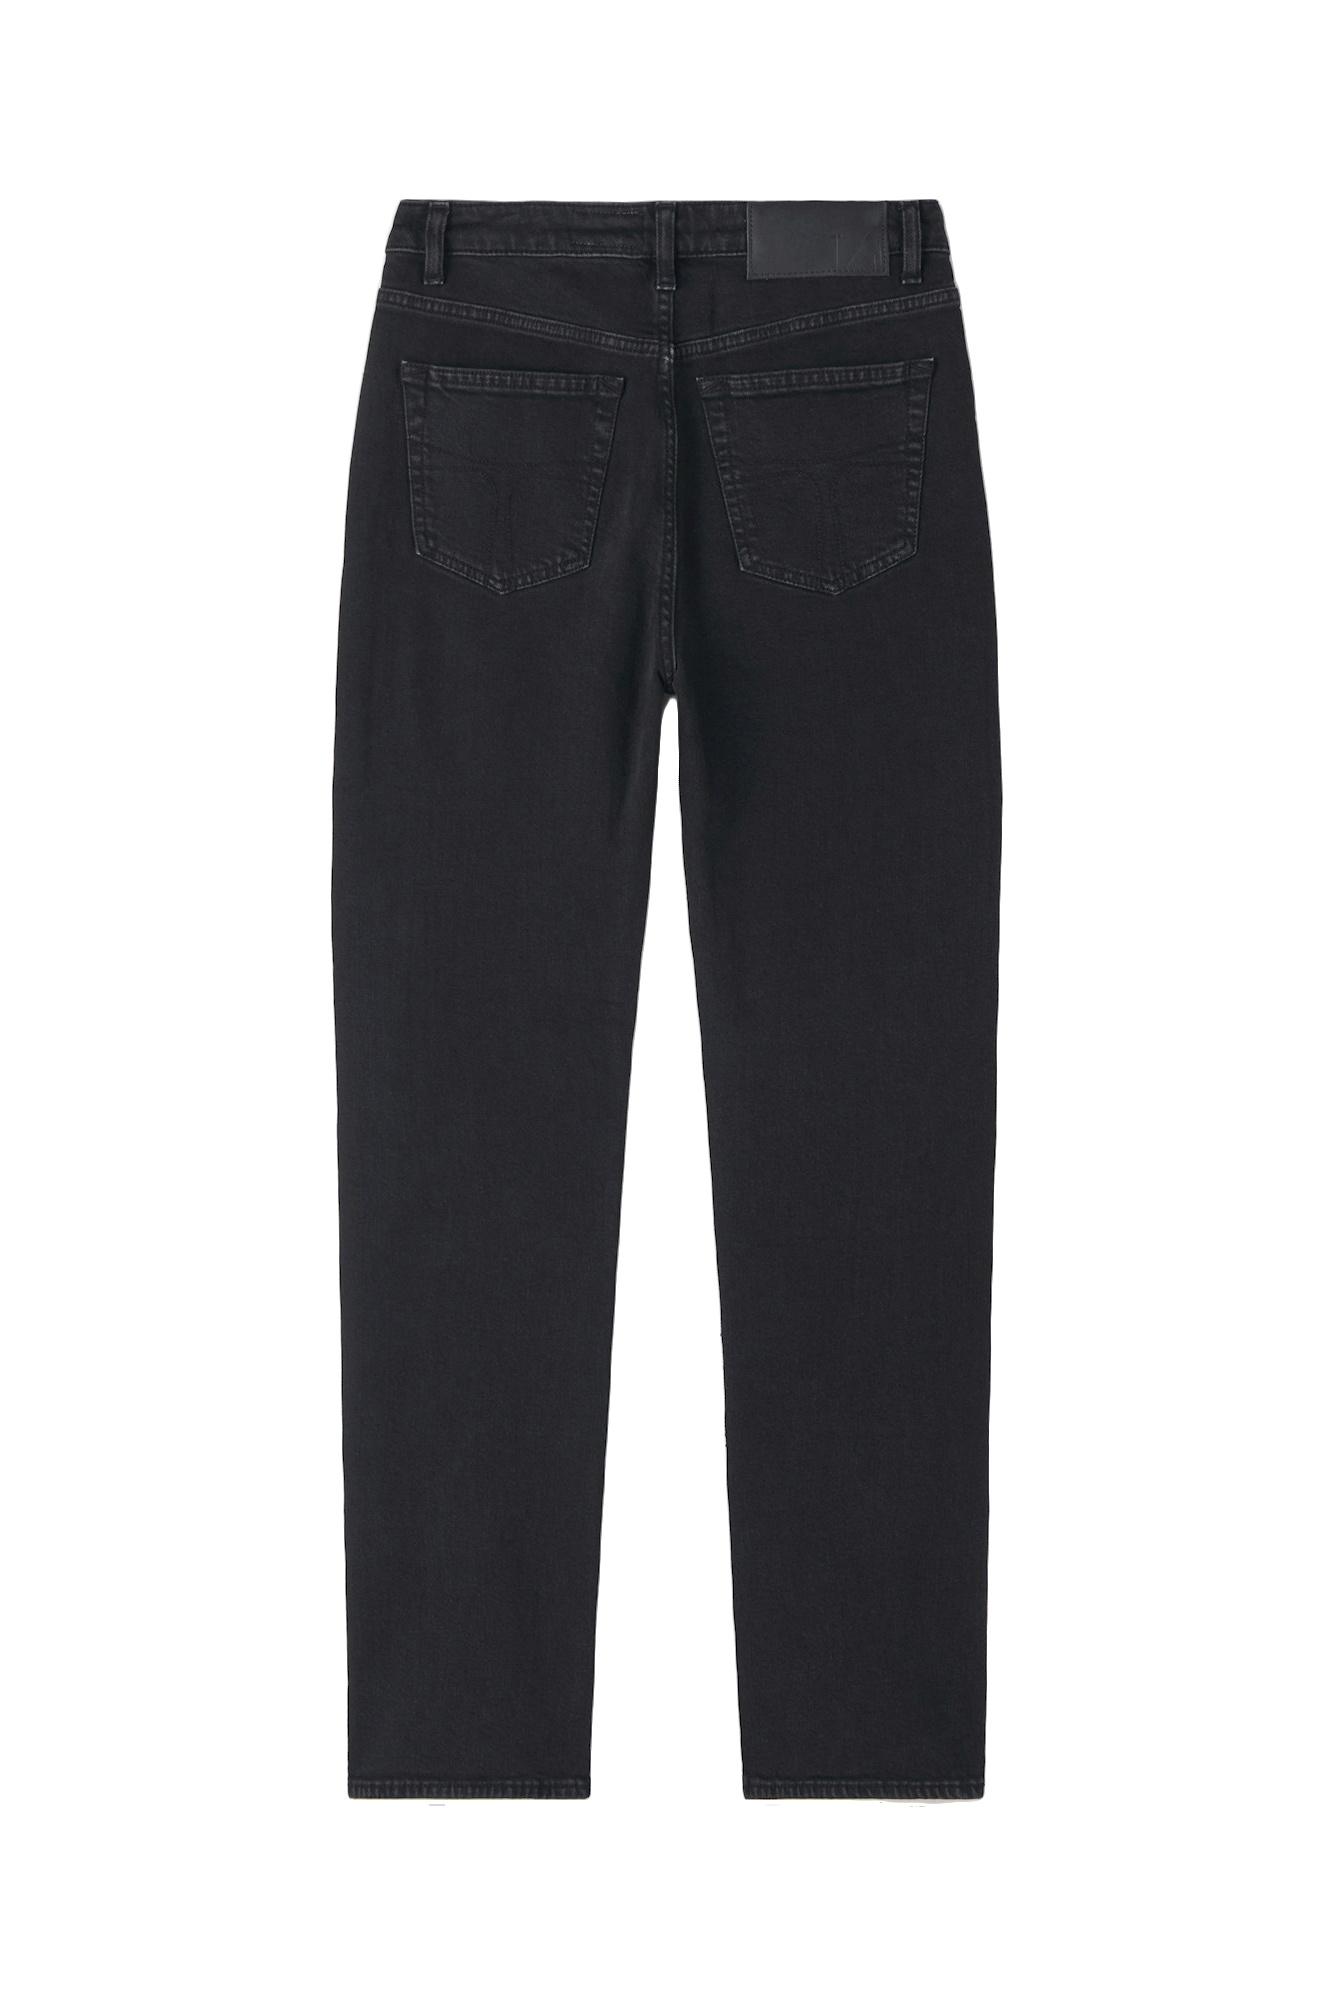 Meg Jeans - Black-5